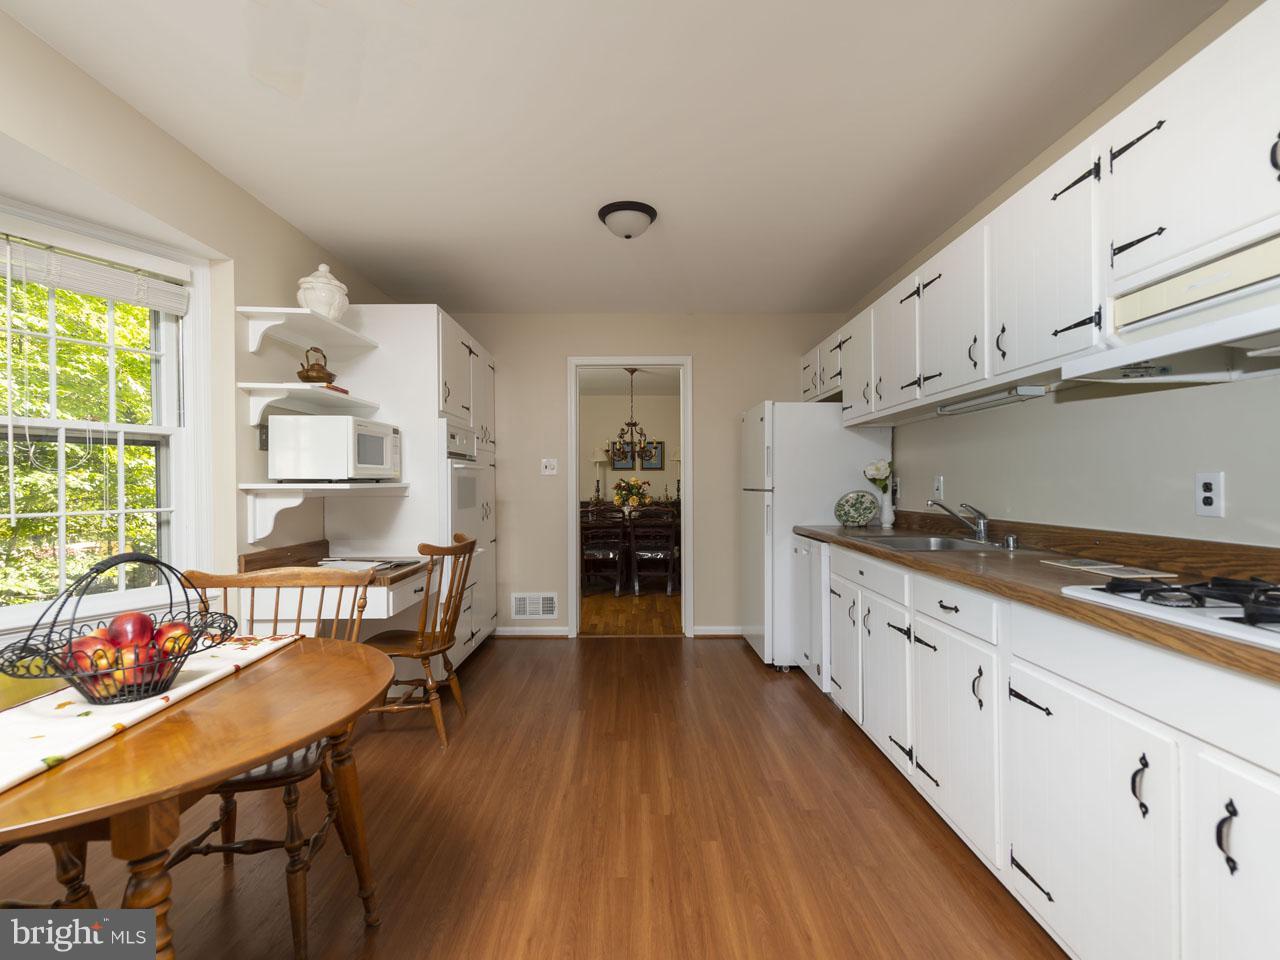 1010014728-300953032605-2021-09-05-13-50-26  |   | Annandale Delaware Real Estate For Sale | MLS# 1010014728  - Best of Northern Virginia